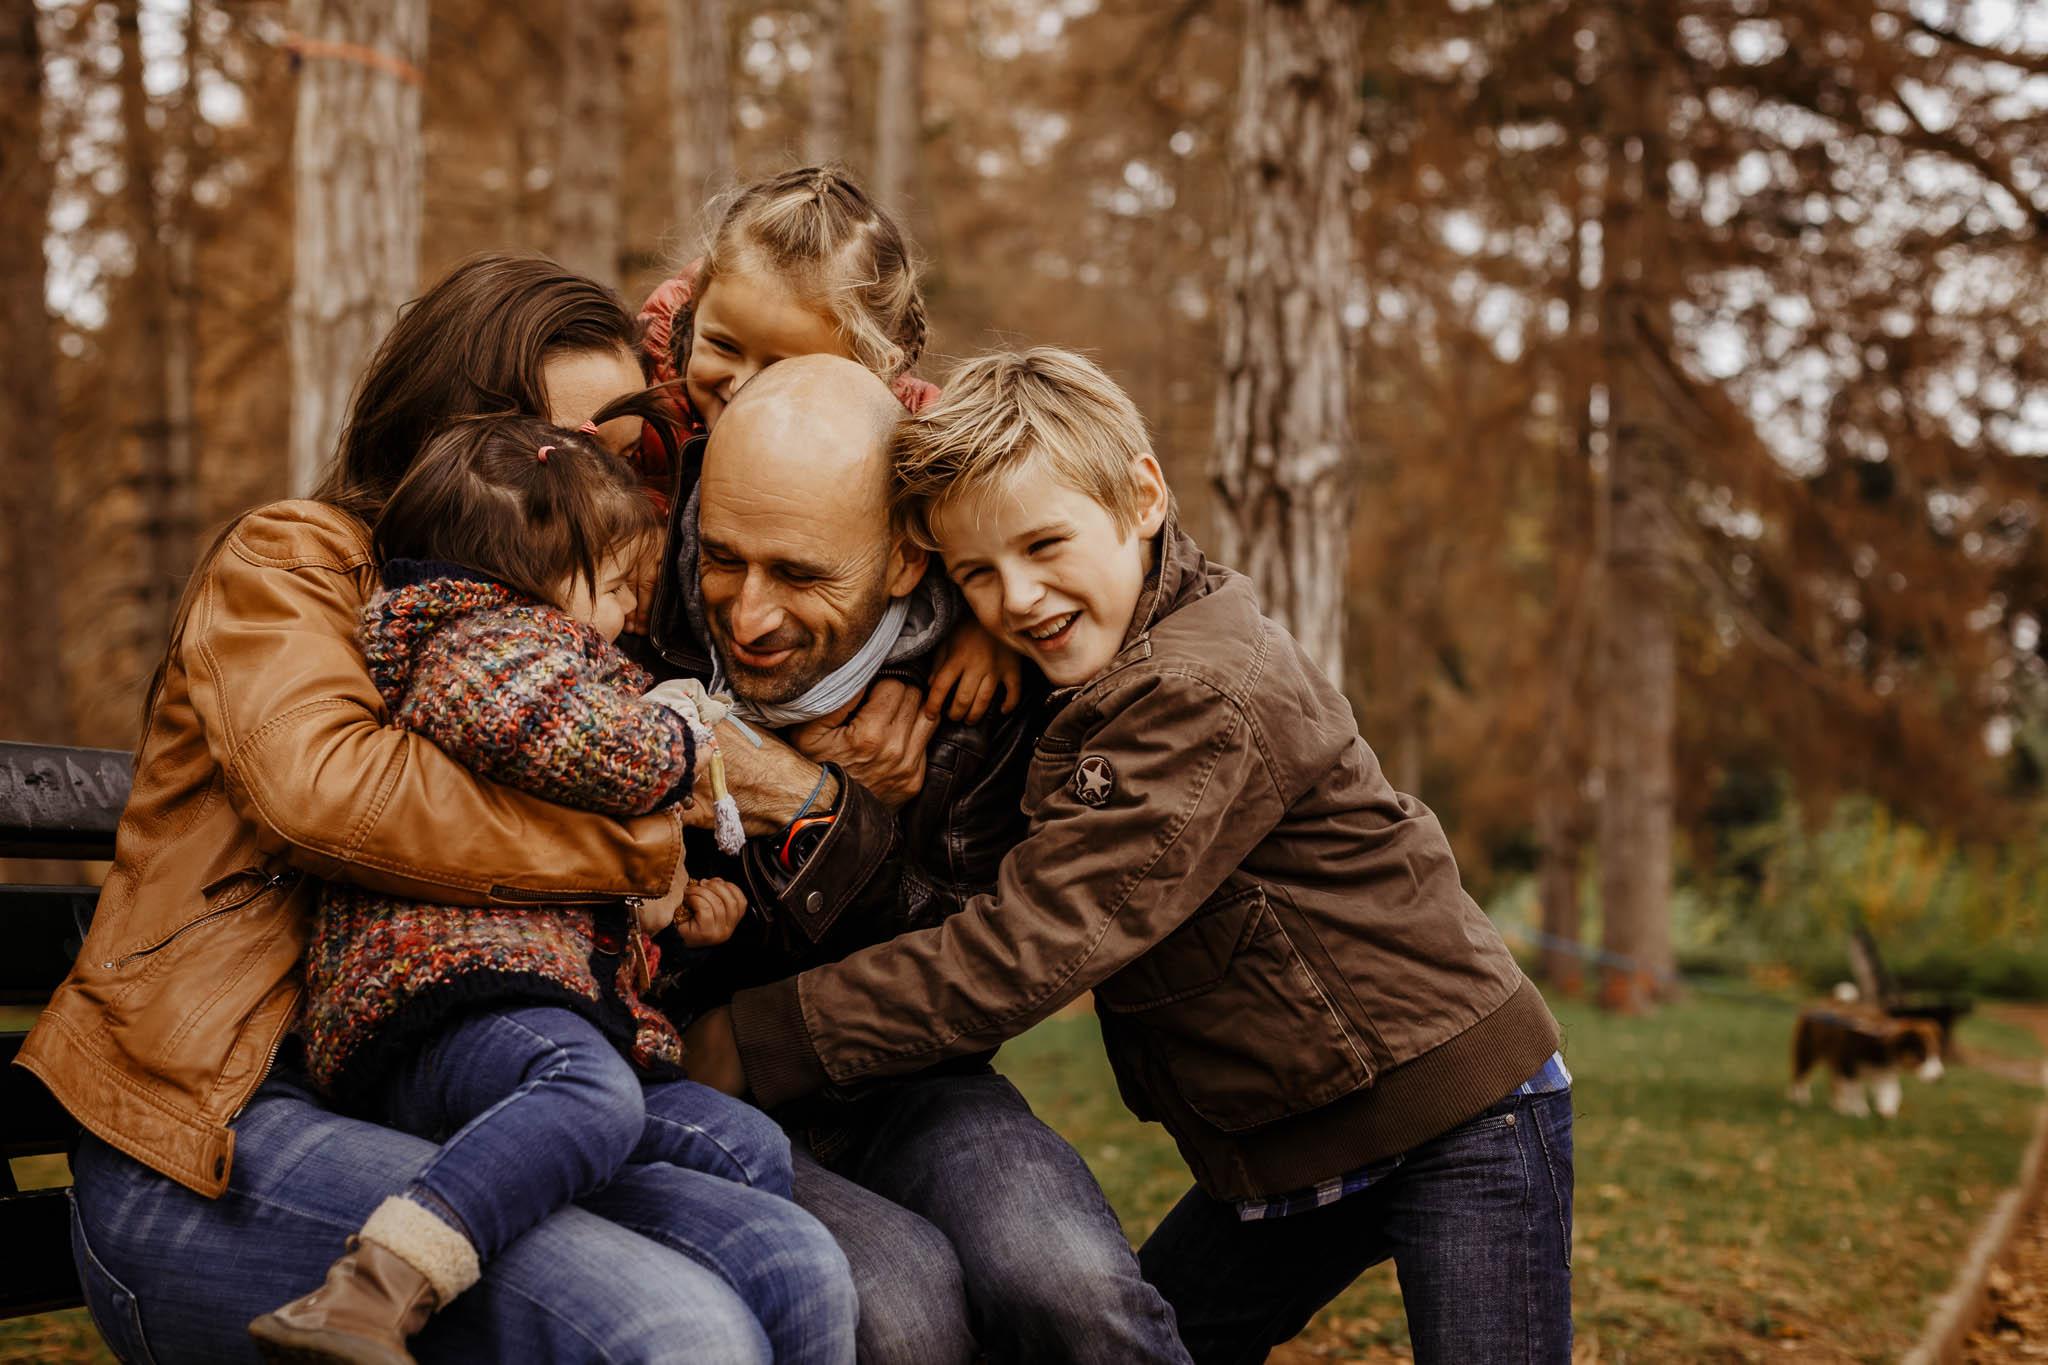 famille-lyon-parc-ingold-25.jpg